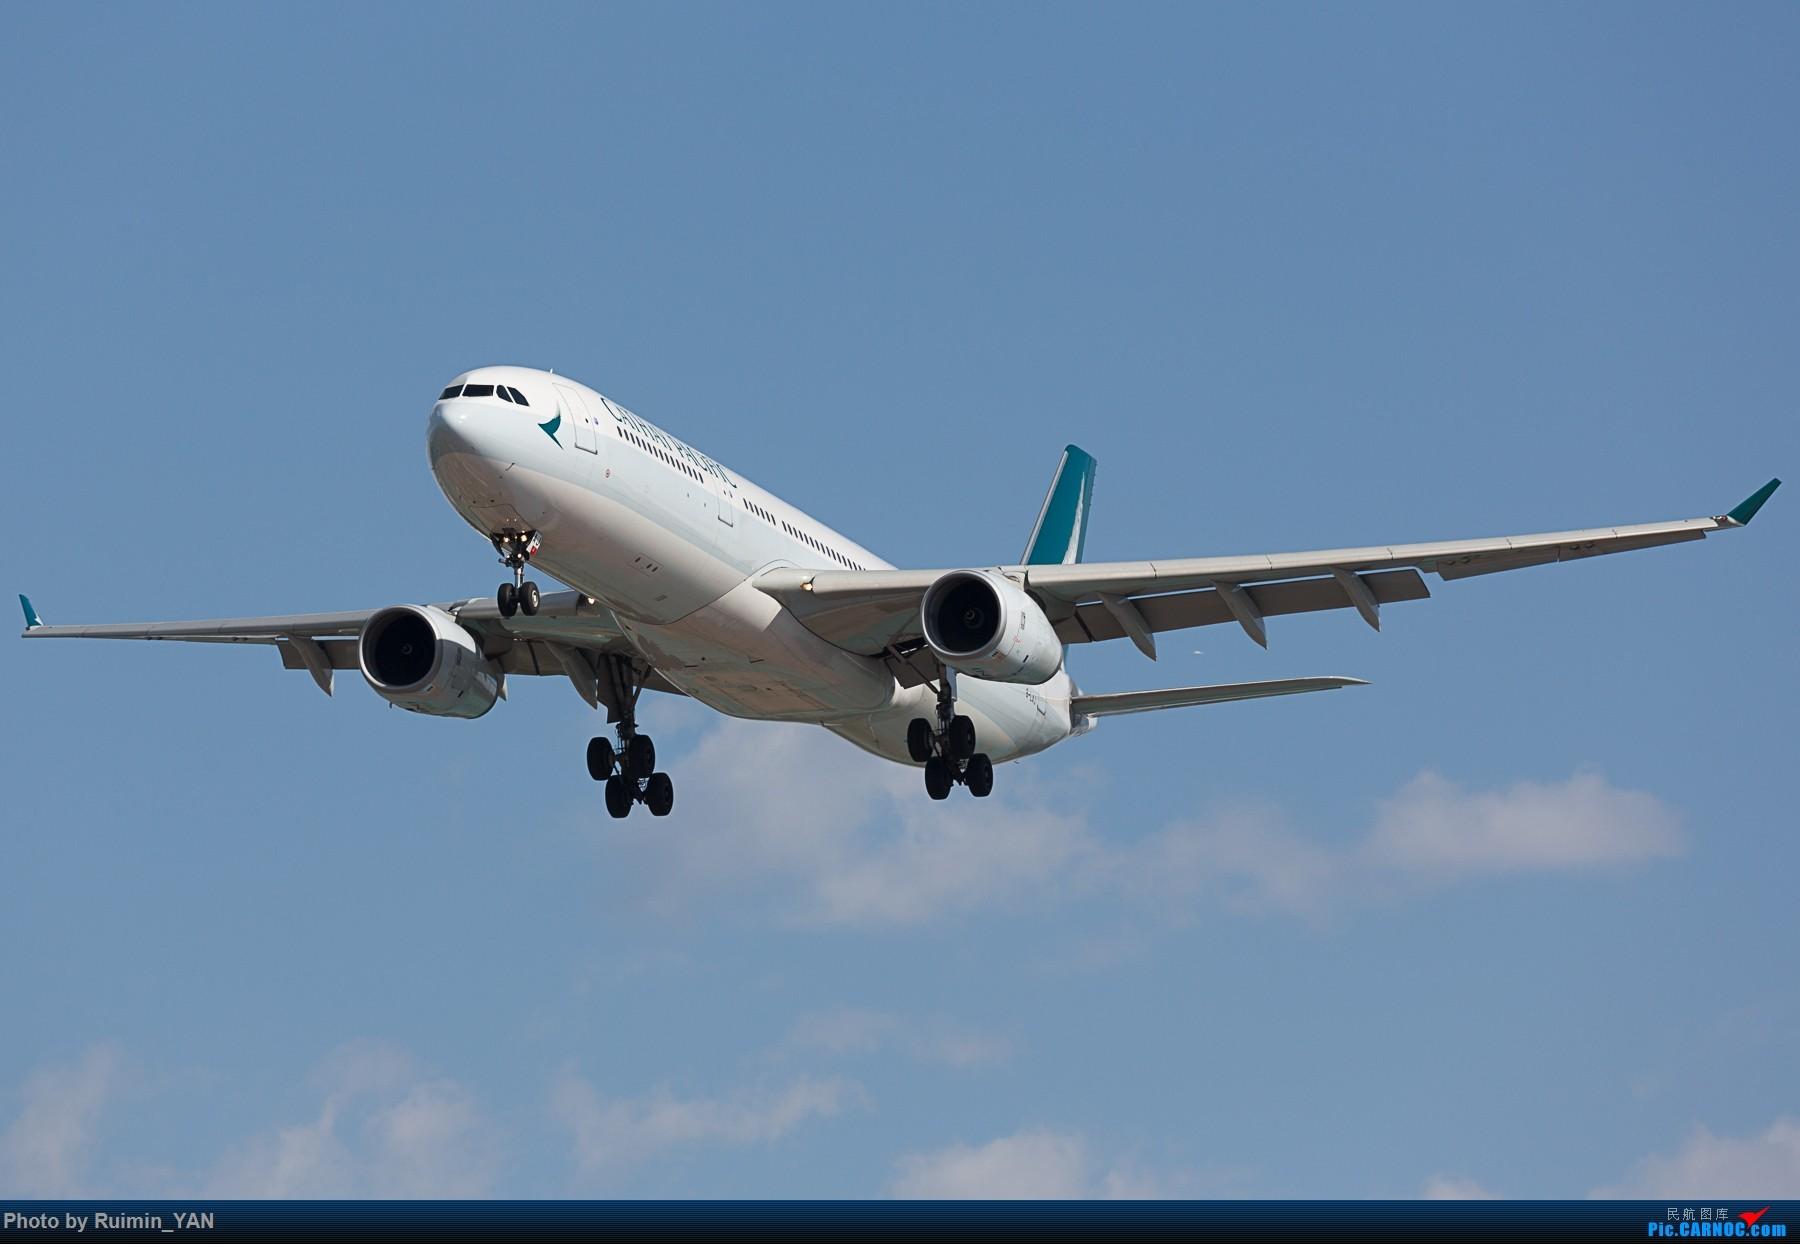 【PEK】【新装】国泰航空(CX, Cathay Pacific) B-LAJ A333 AIRBUS A330-300 B-LAJ 中国北京首都国际机场